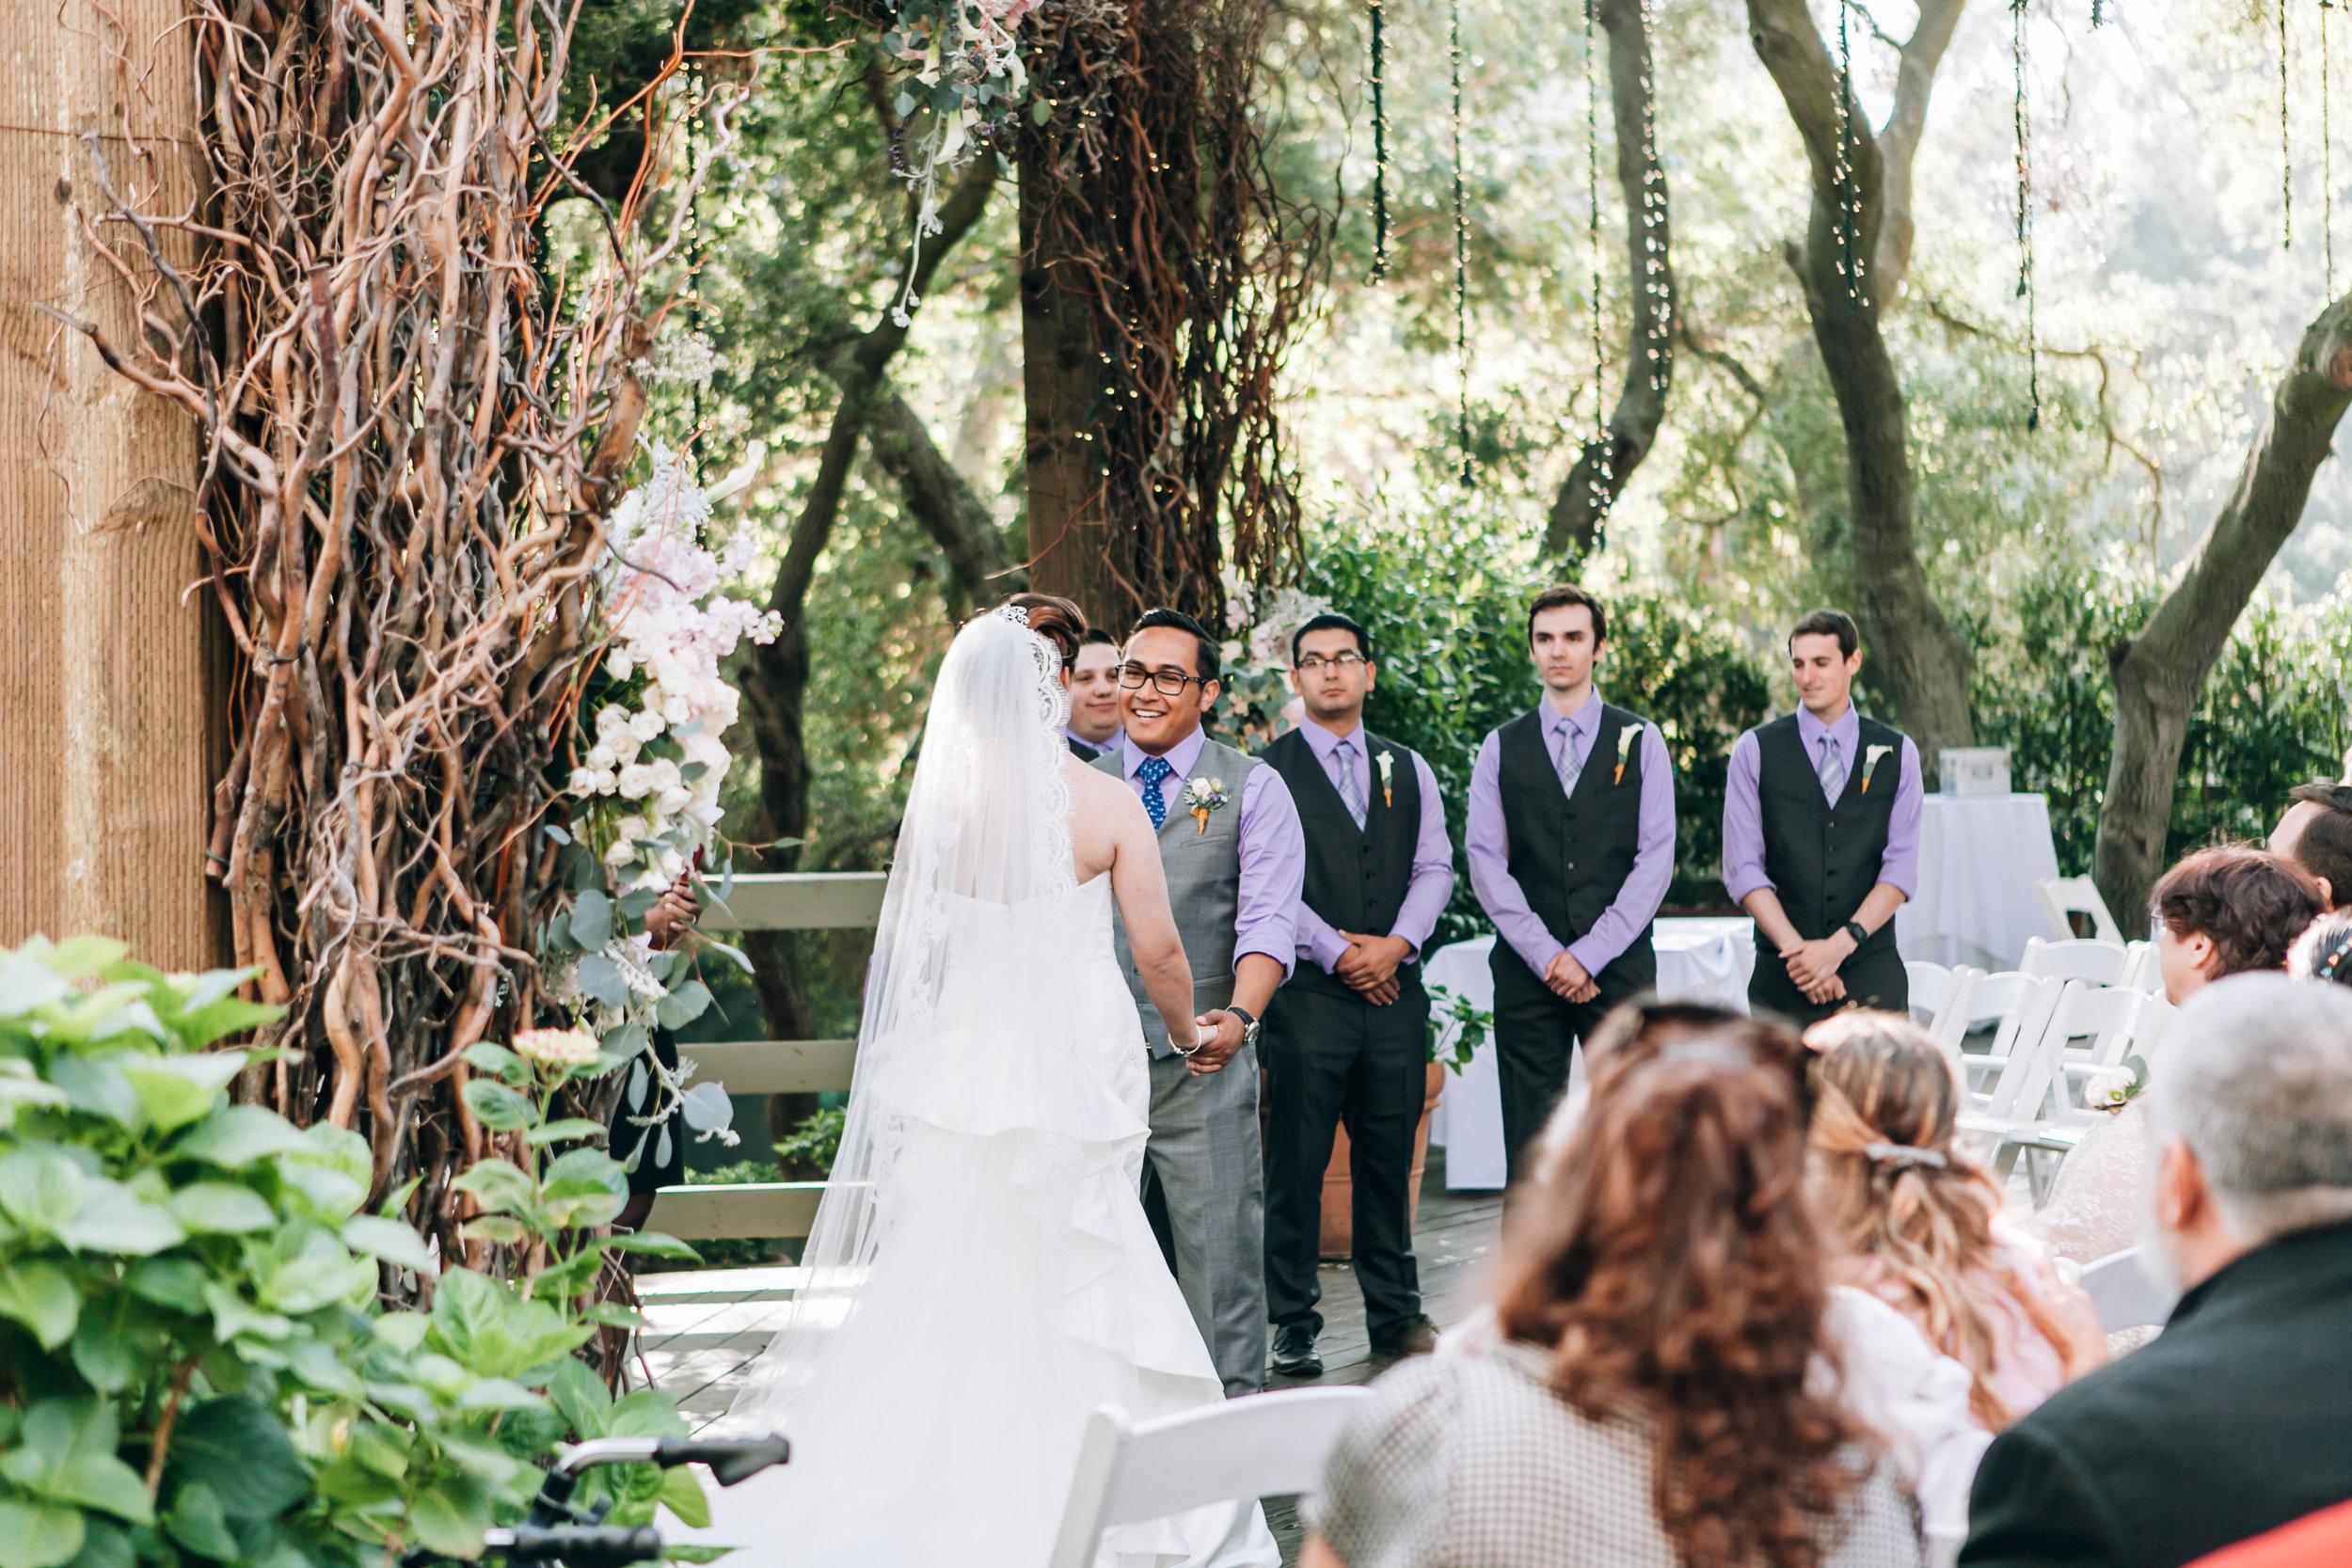 KaraNixonWeddings-Malibu-Wedding-36.jpg